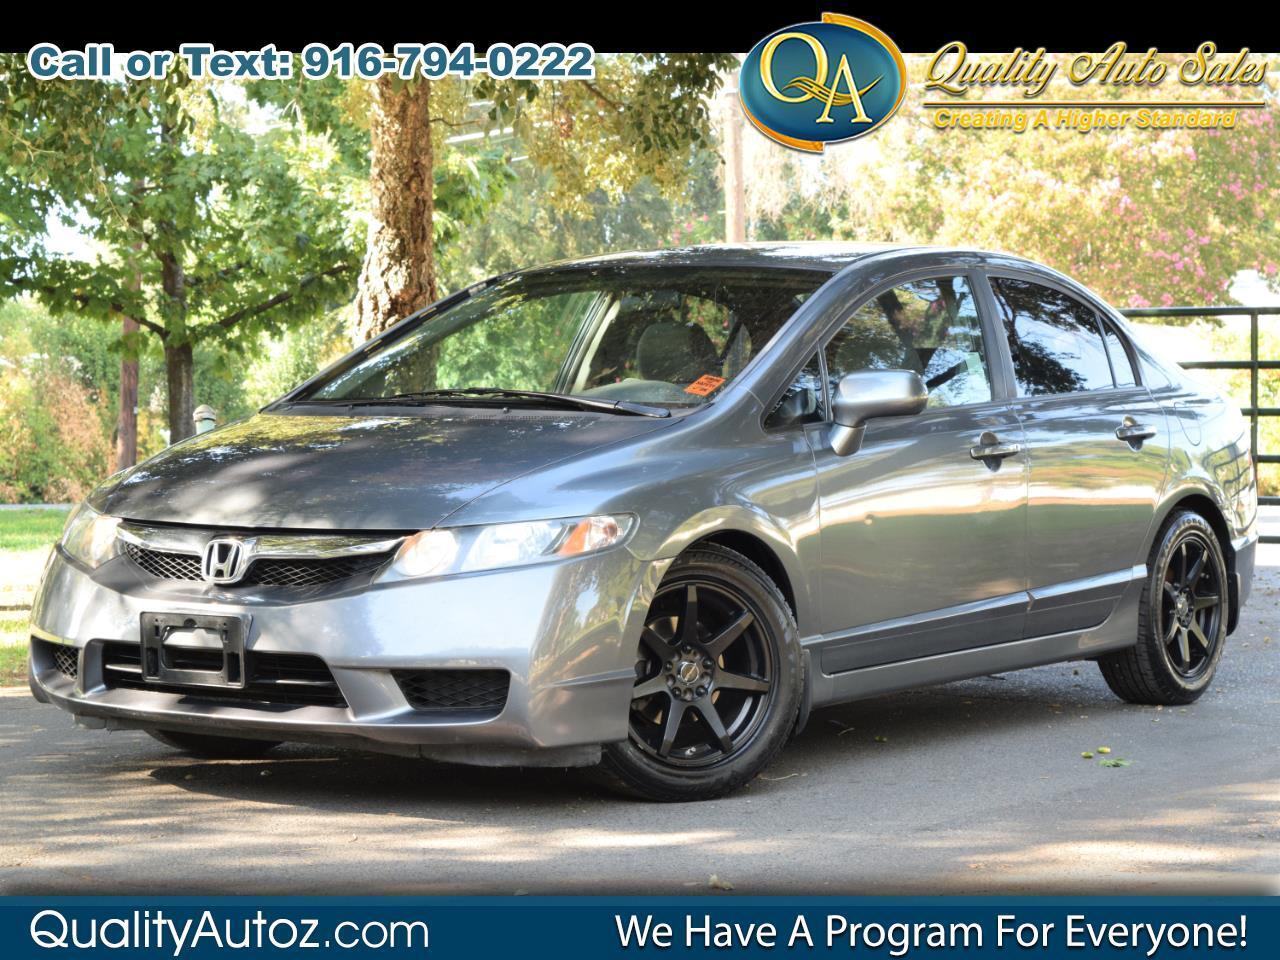 2011 Honda Civic Sdn 4dr Auto LX